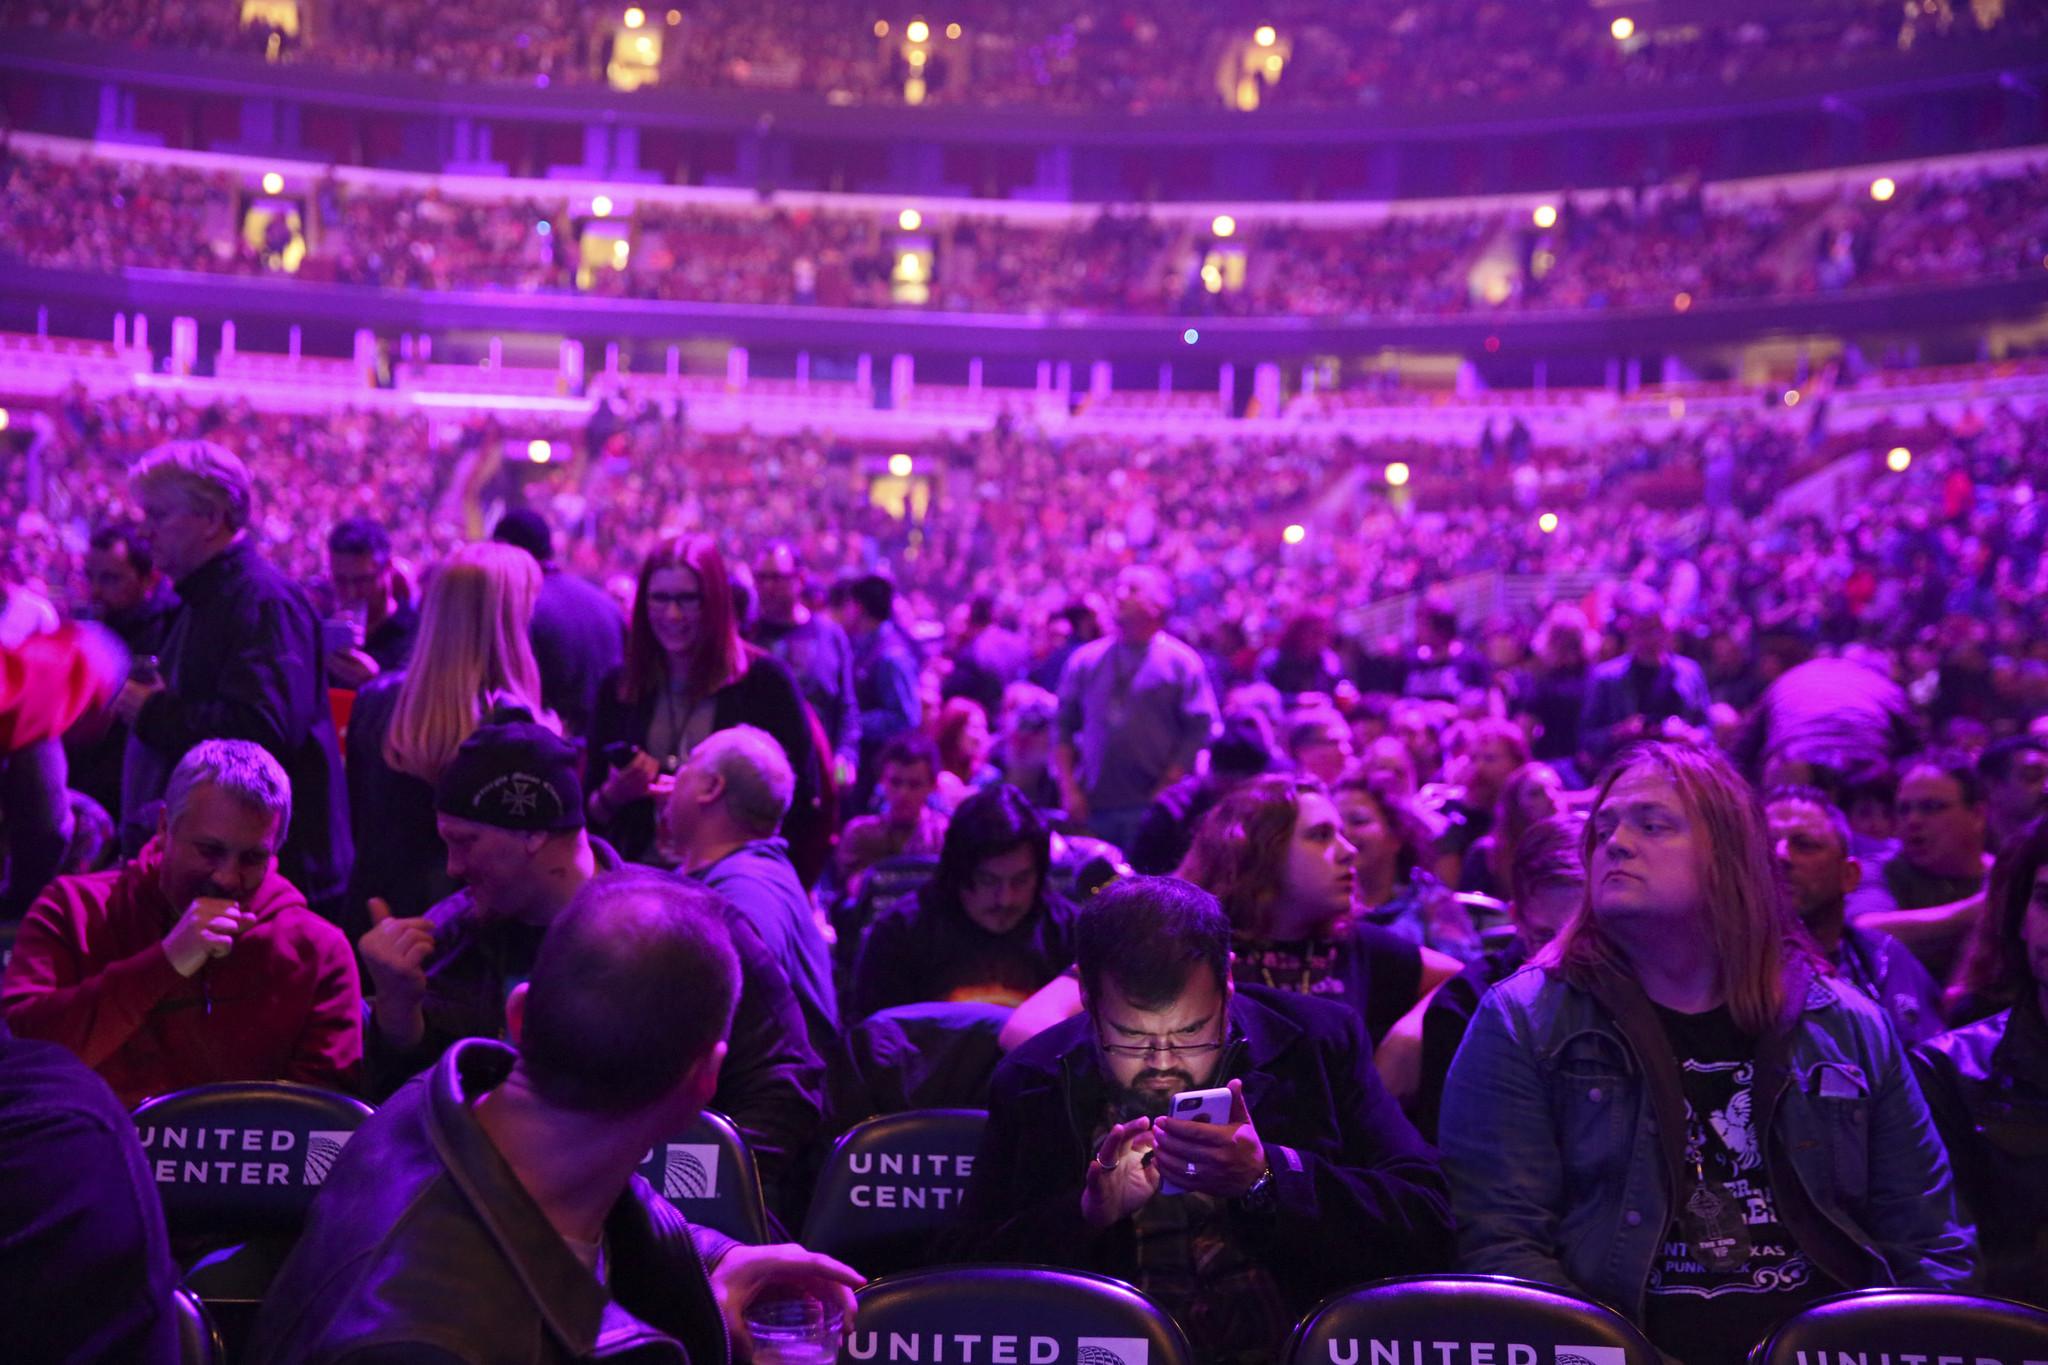 Black Sabbath says farewell at United Center